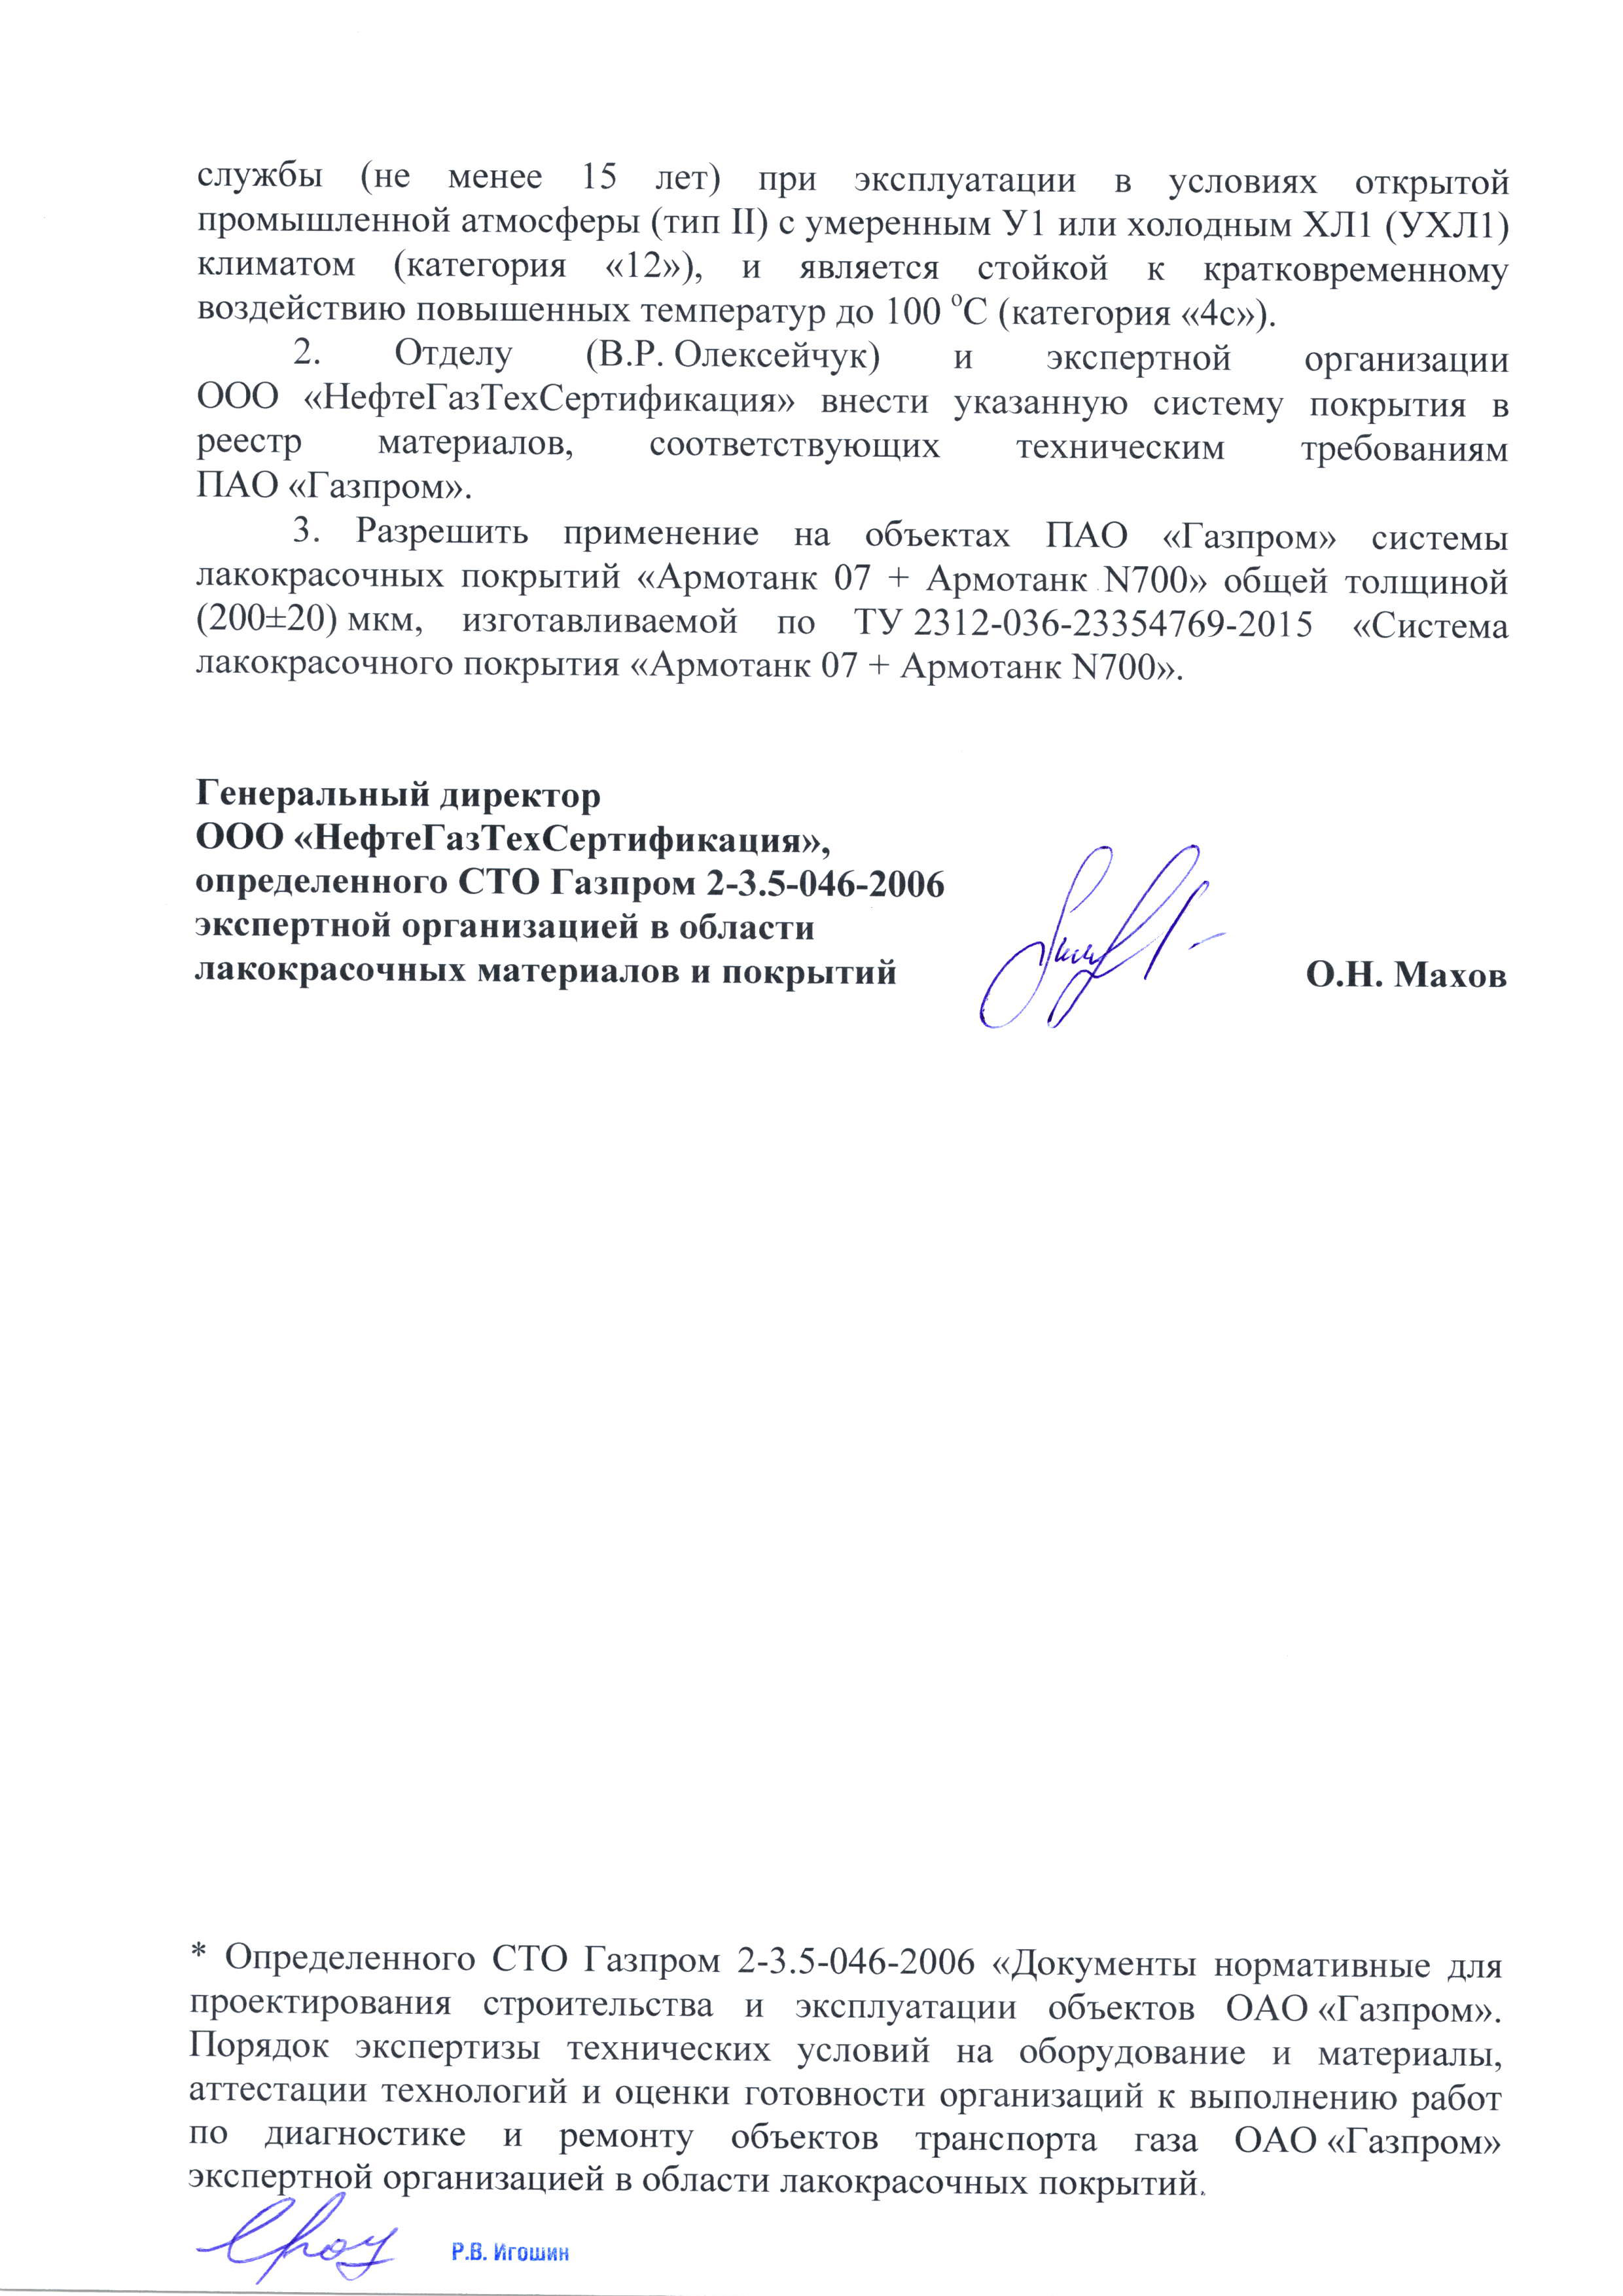 Газпром протокол № 002-17-01 07+N700_Страница_2